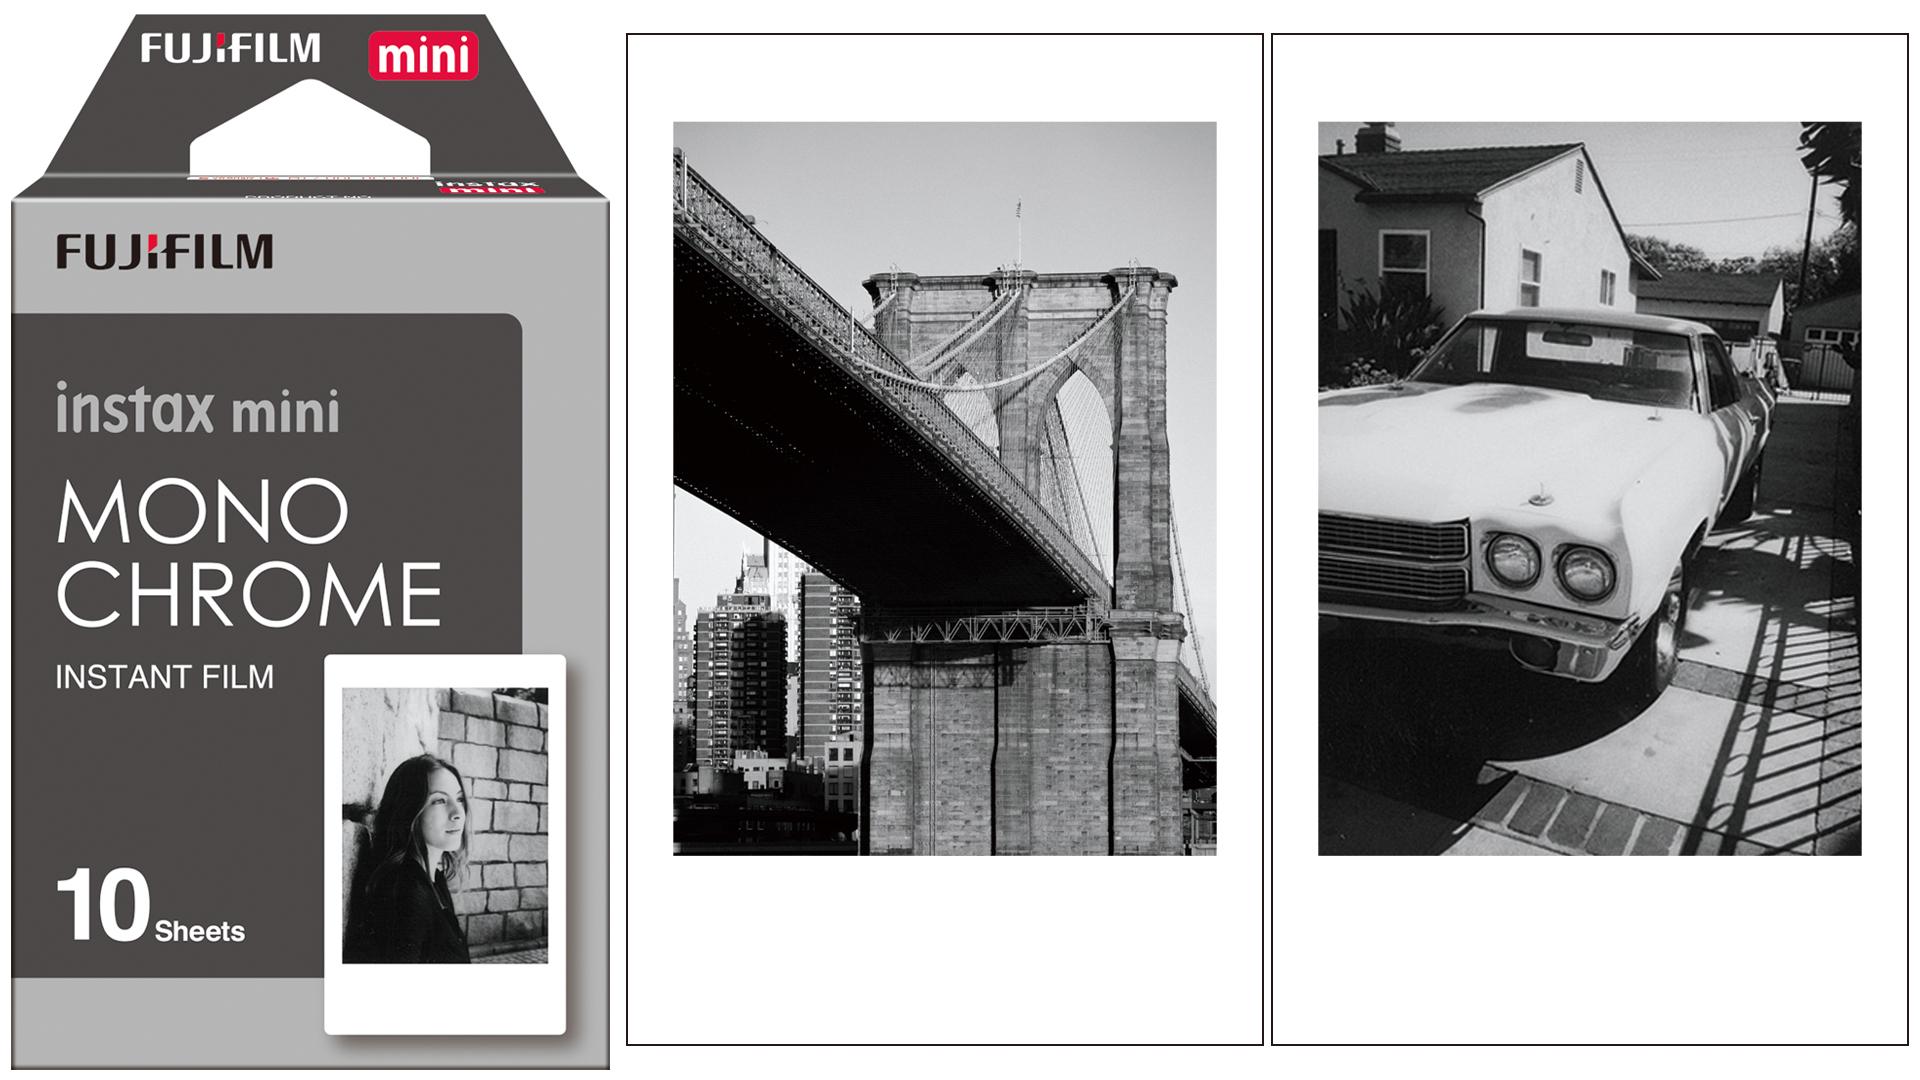 FujiFilm Unveils Instax Mini Monochrome